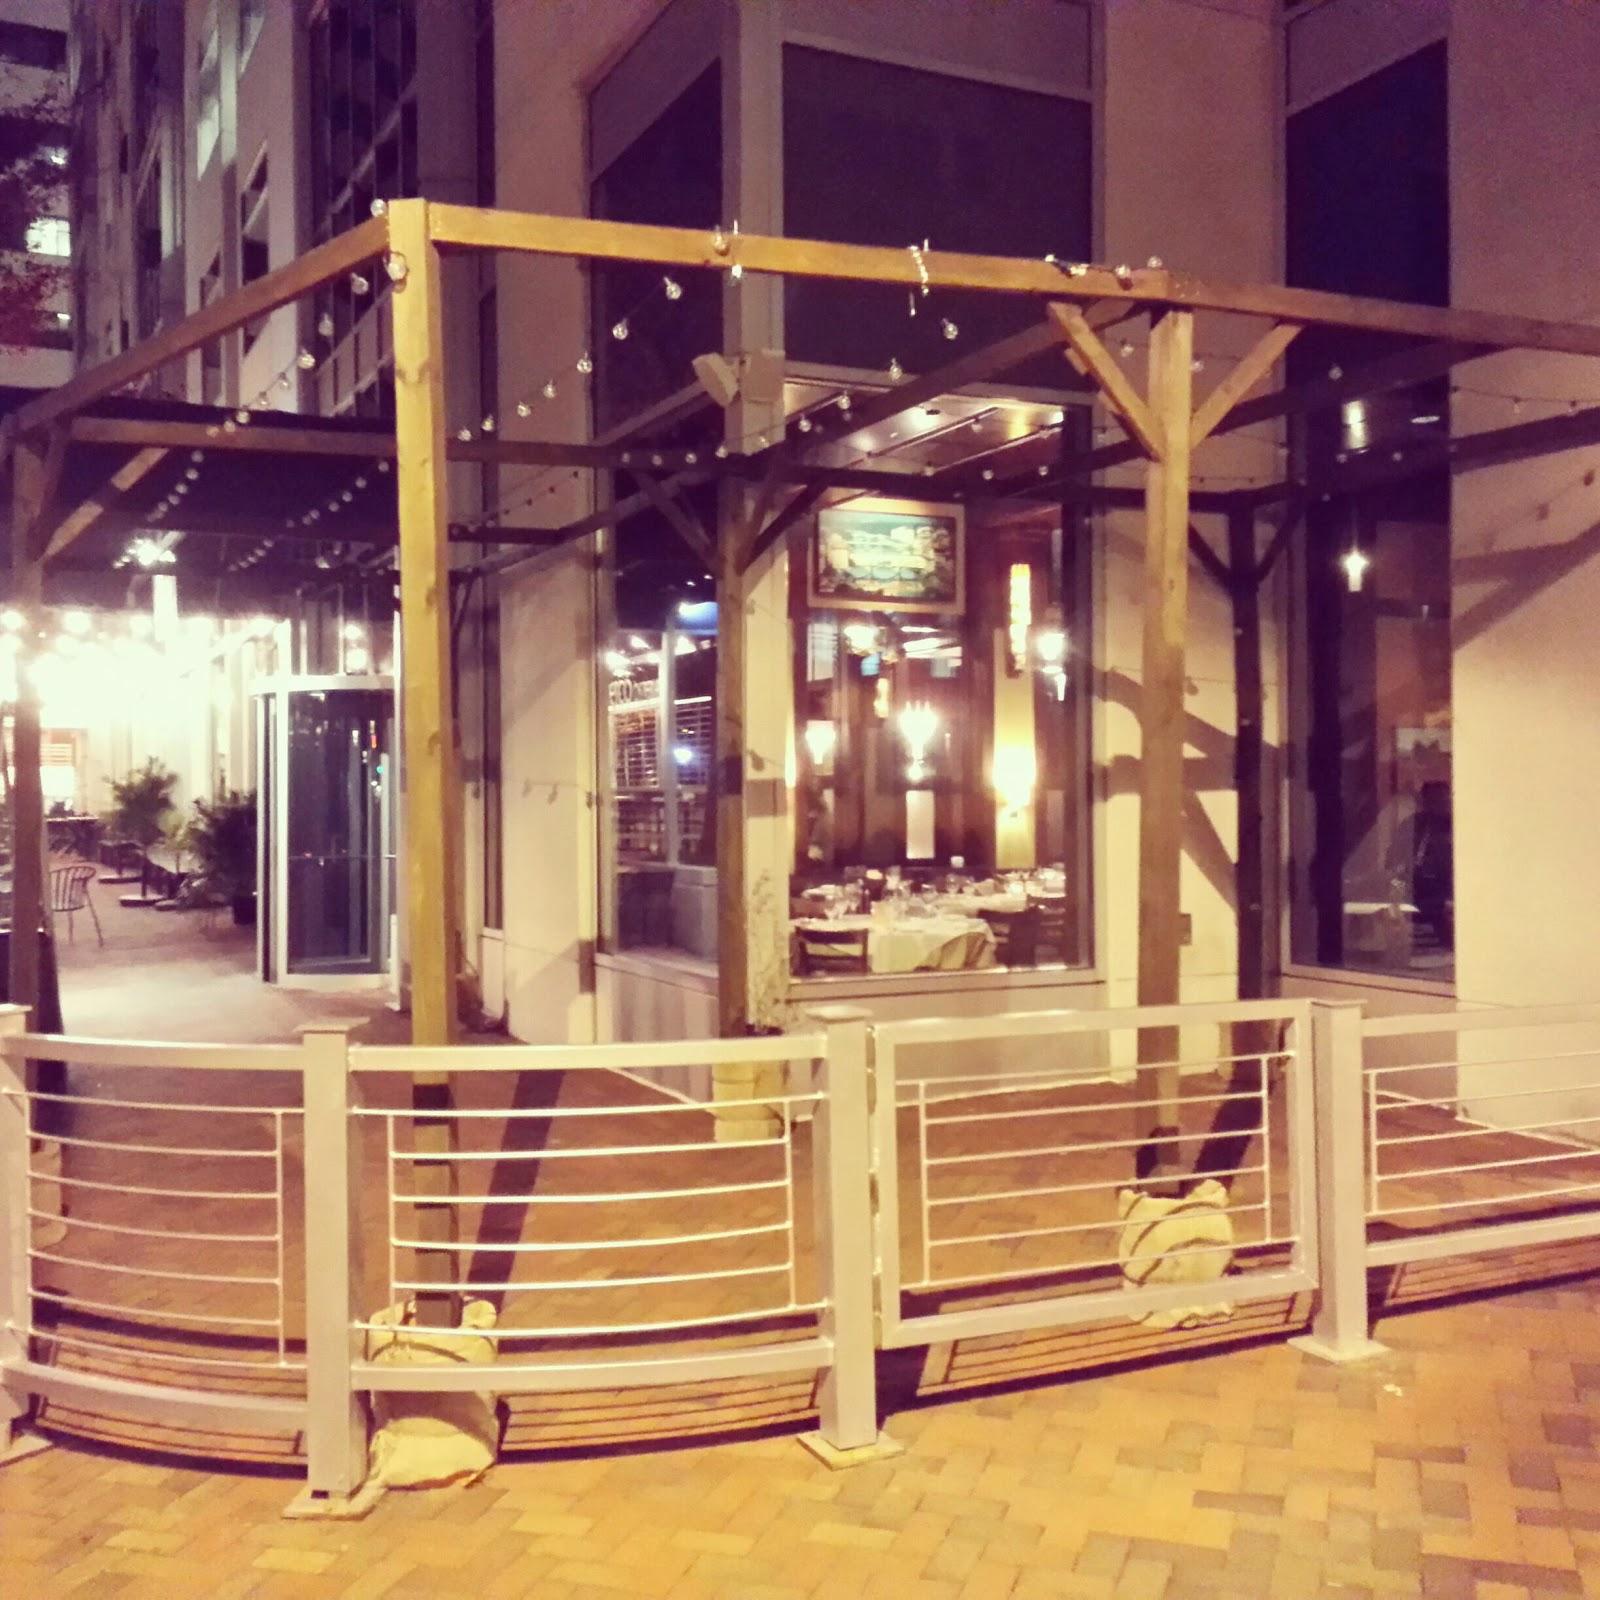 Garden La Piazza: Robert Dyer @ Bethesda Row: LA PIAZZA BEER GARDEN MOVES